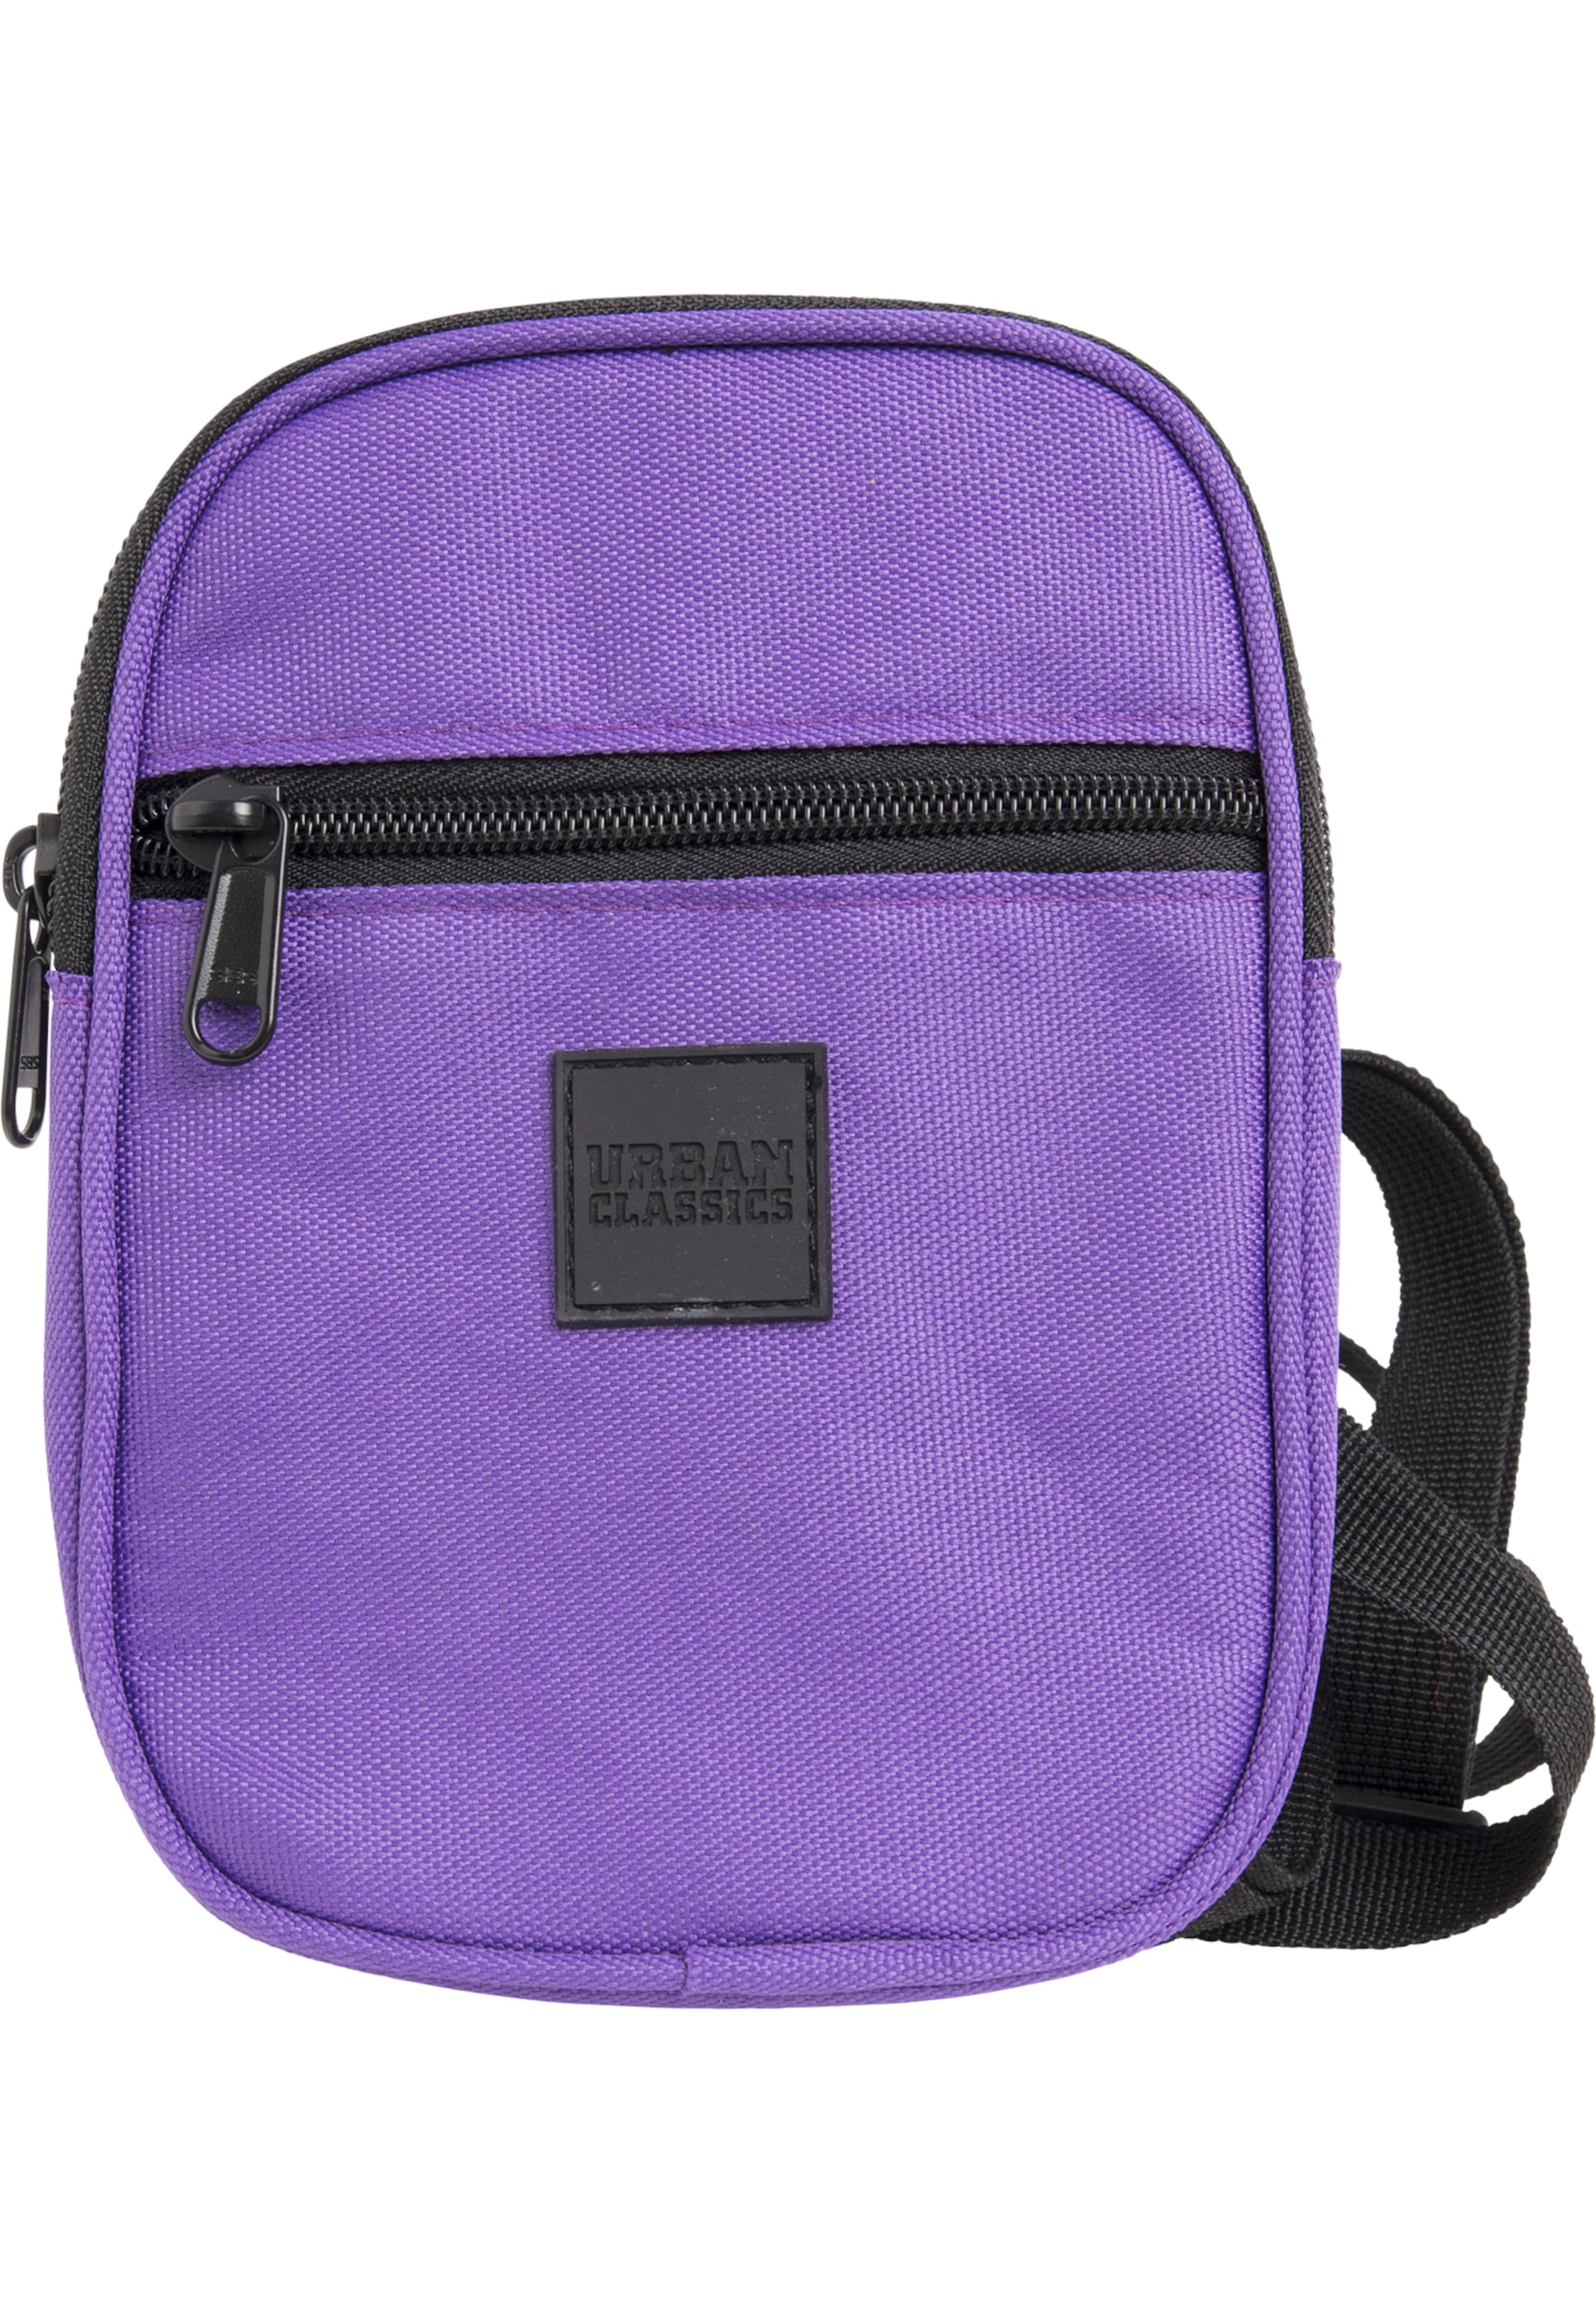 Urban In Urban Bag Bag In Classics Classics NeonlilaSchwarz 0wk8nNOPX